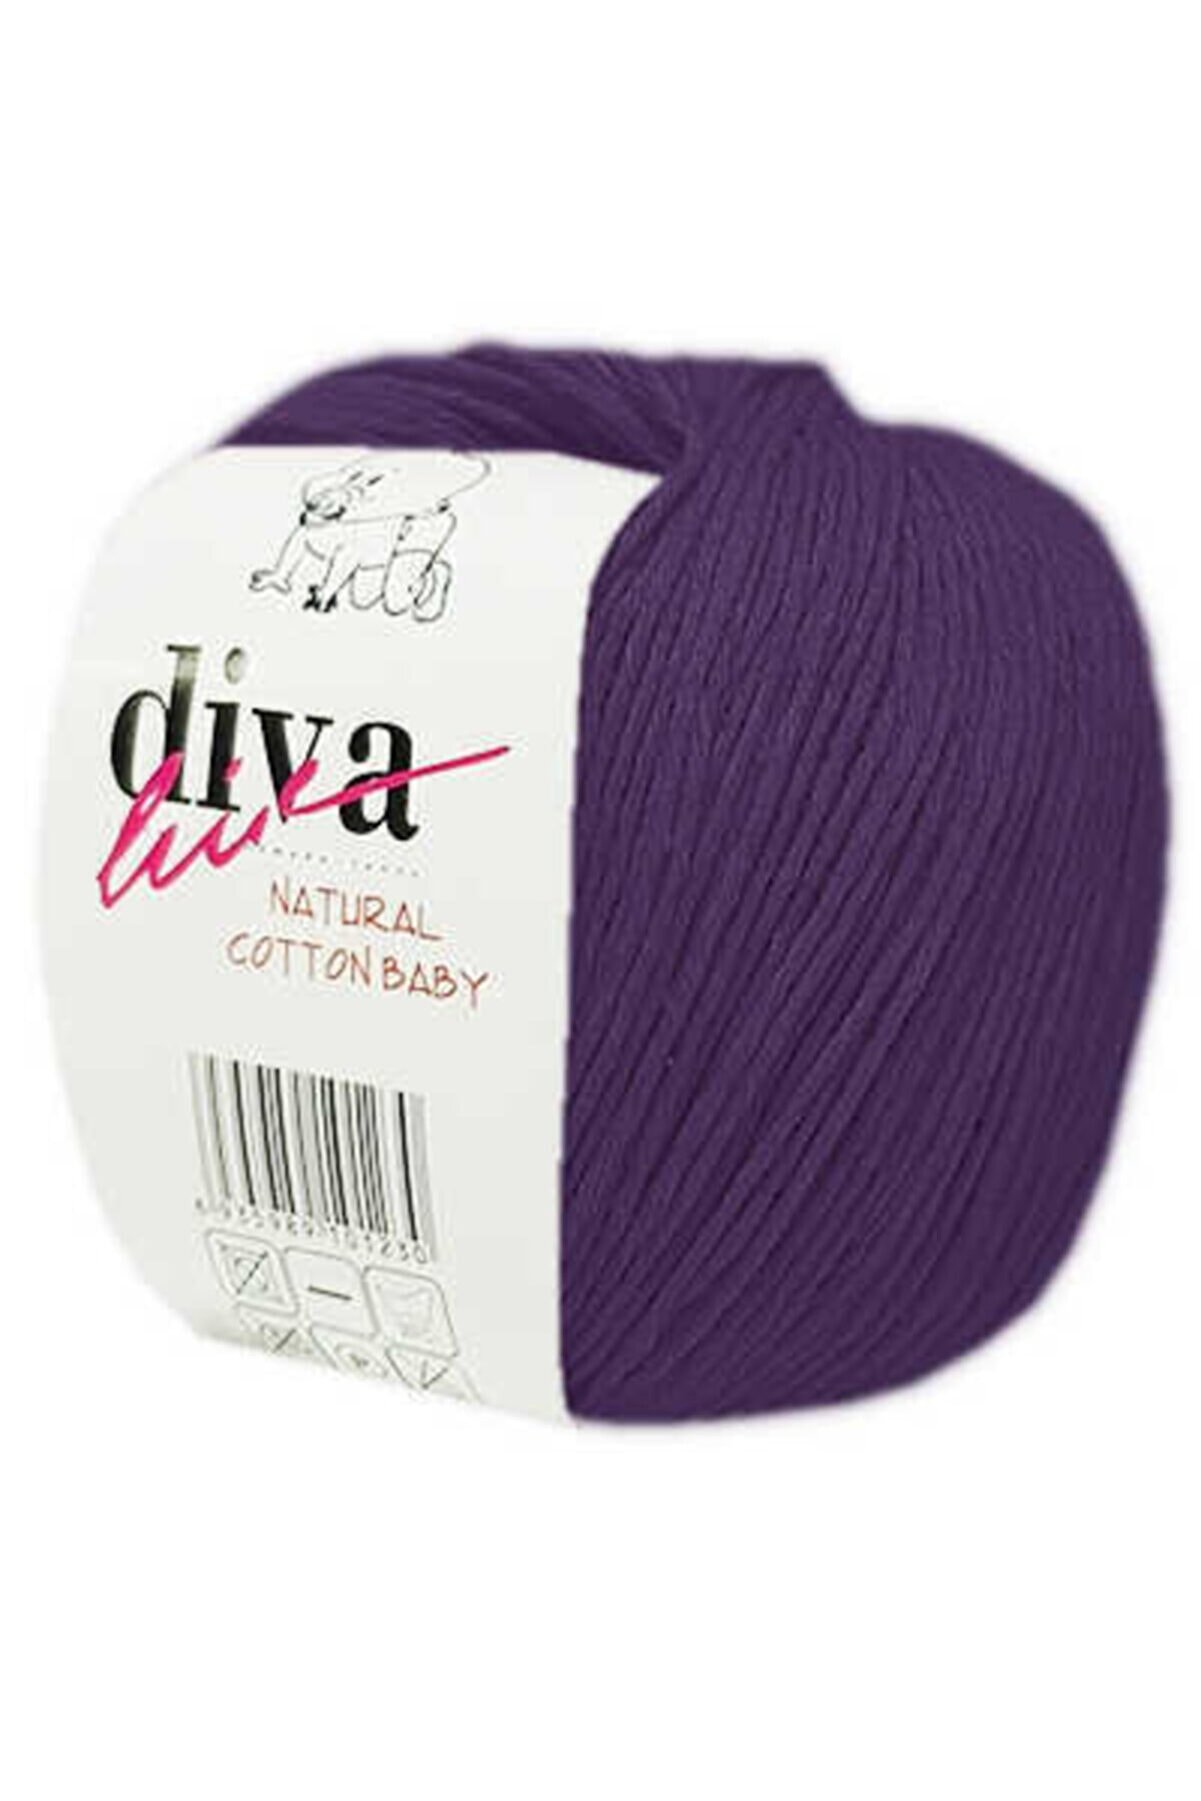 Diva İplik Diva Line Diva Natural Cotton Baby Bebe Ipi 188 Mor